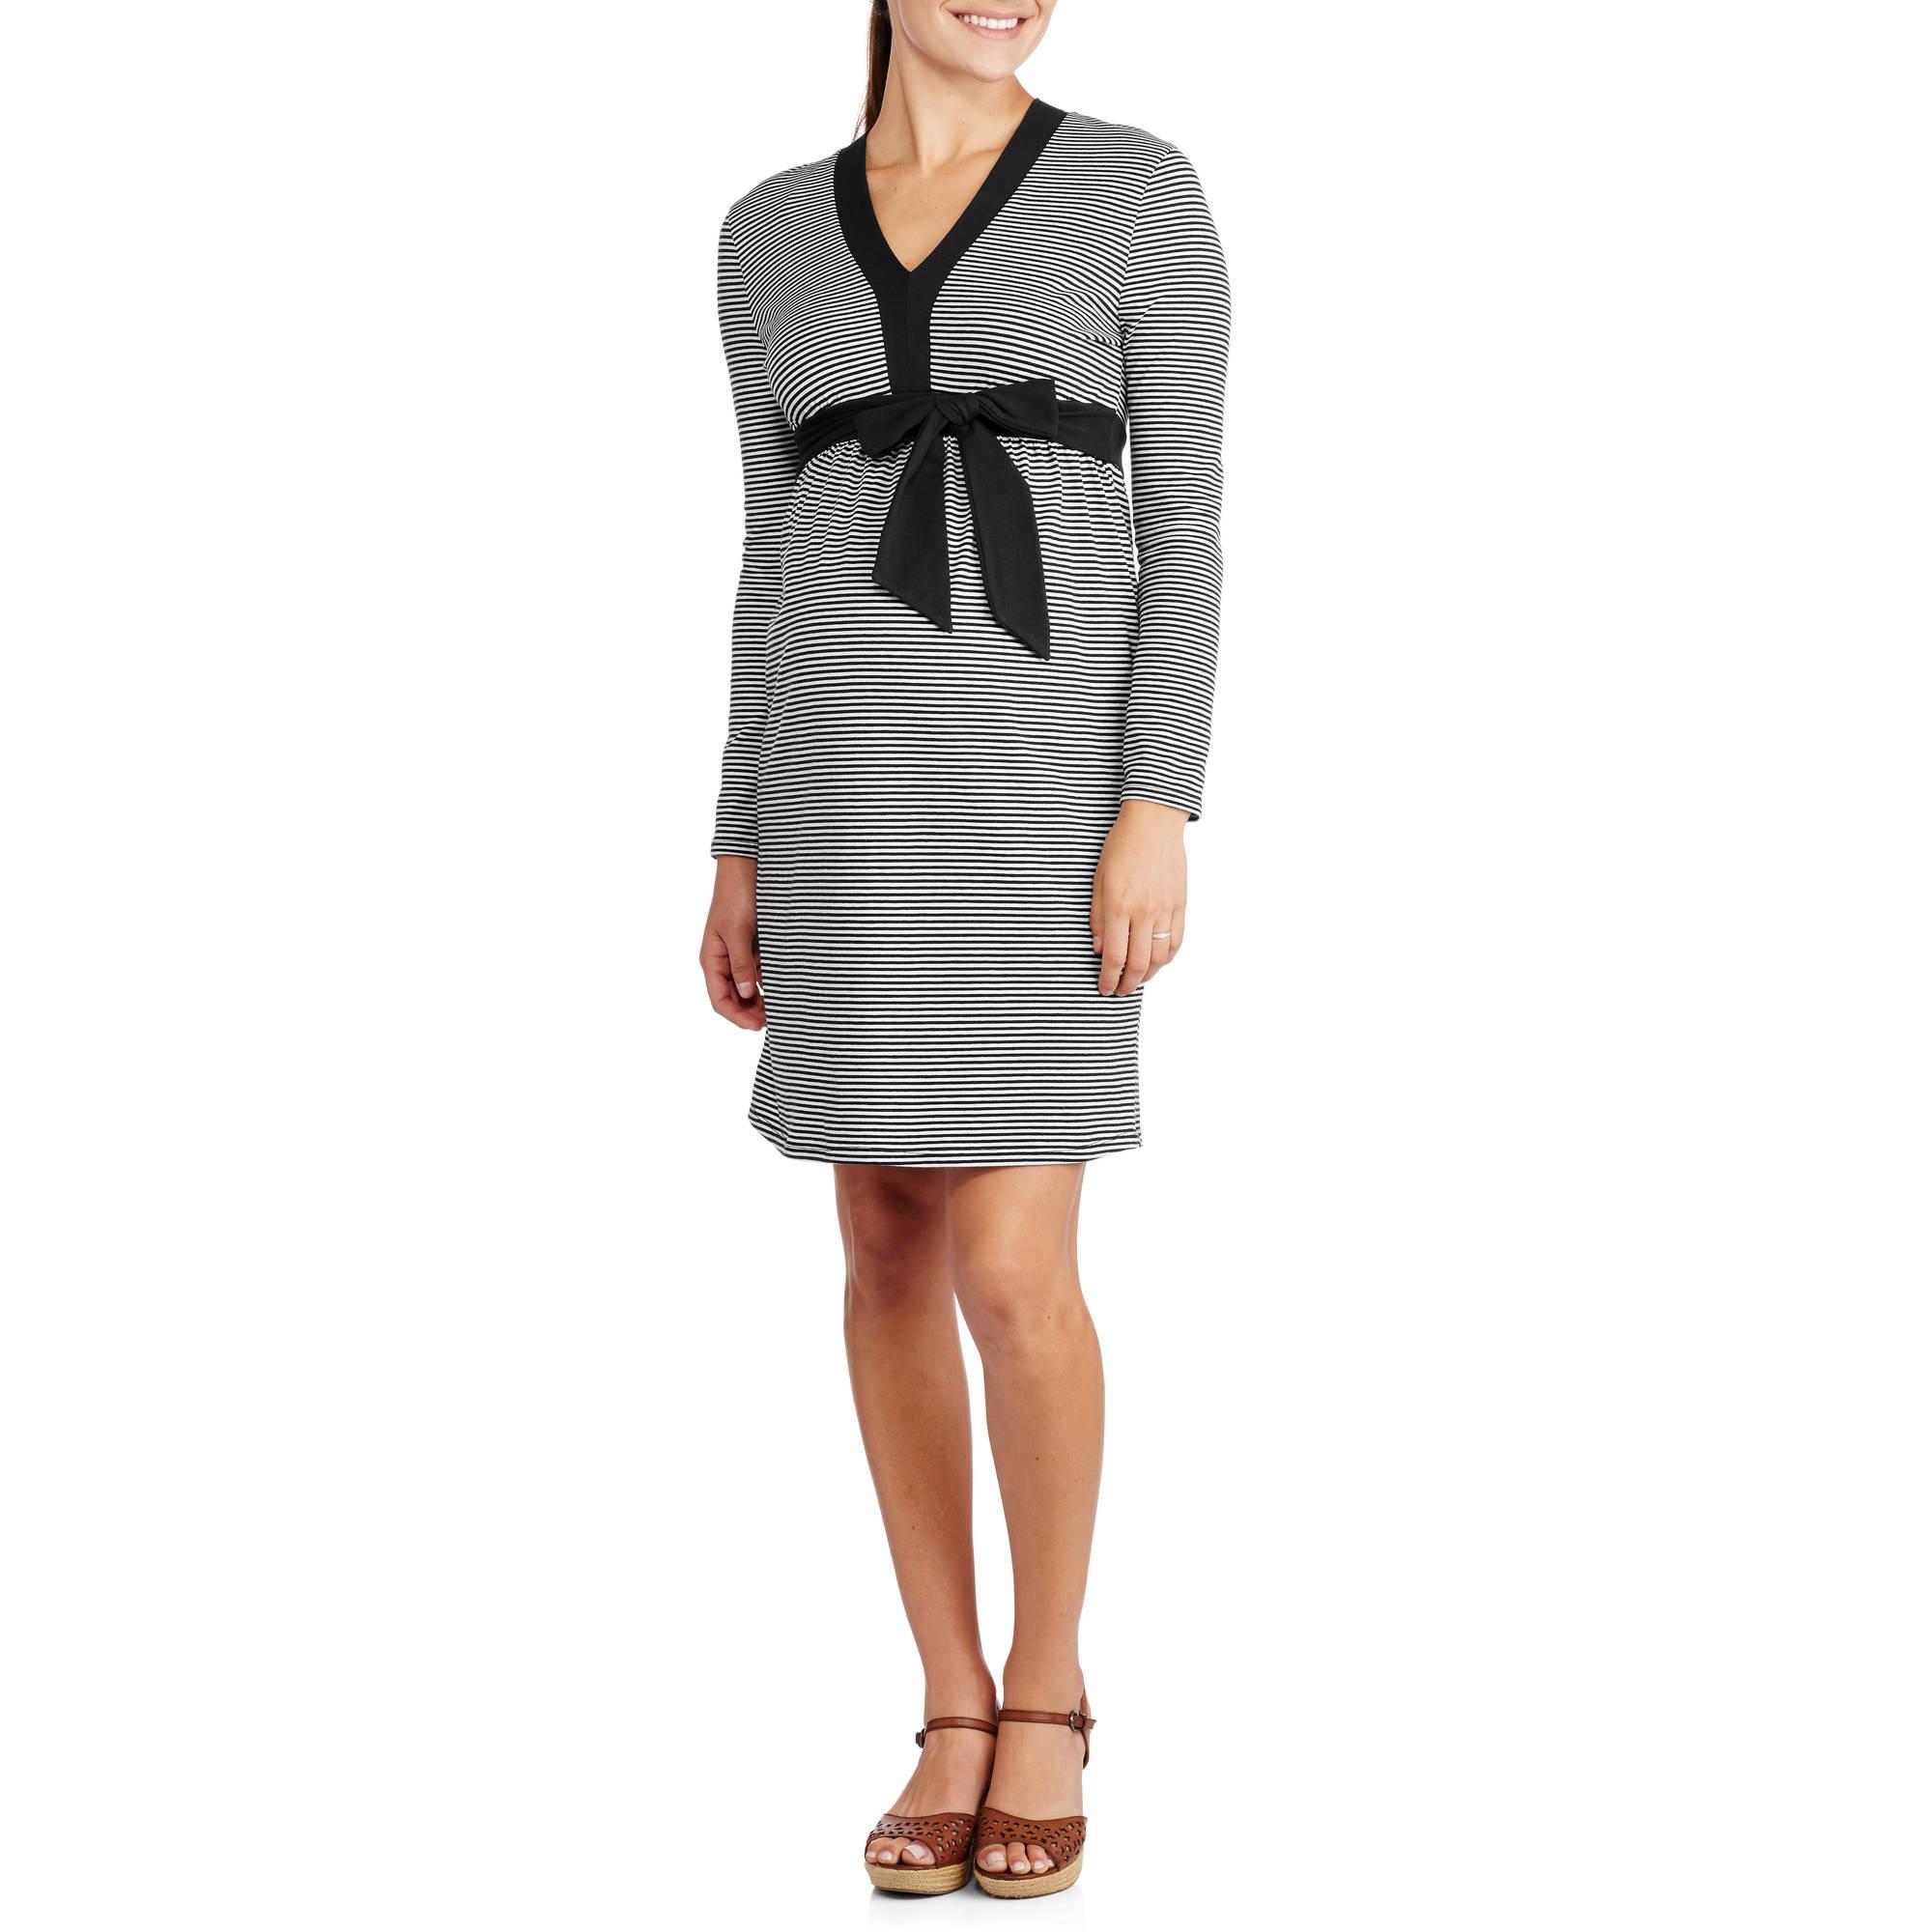 Maternity Long Sleeve Vneck Tie-Front Striped Dress